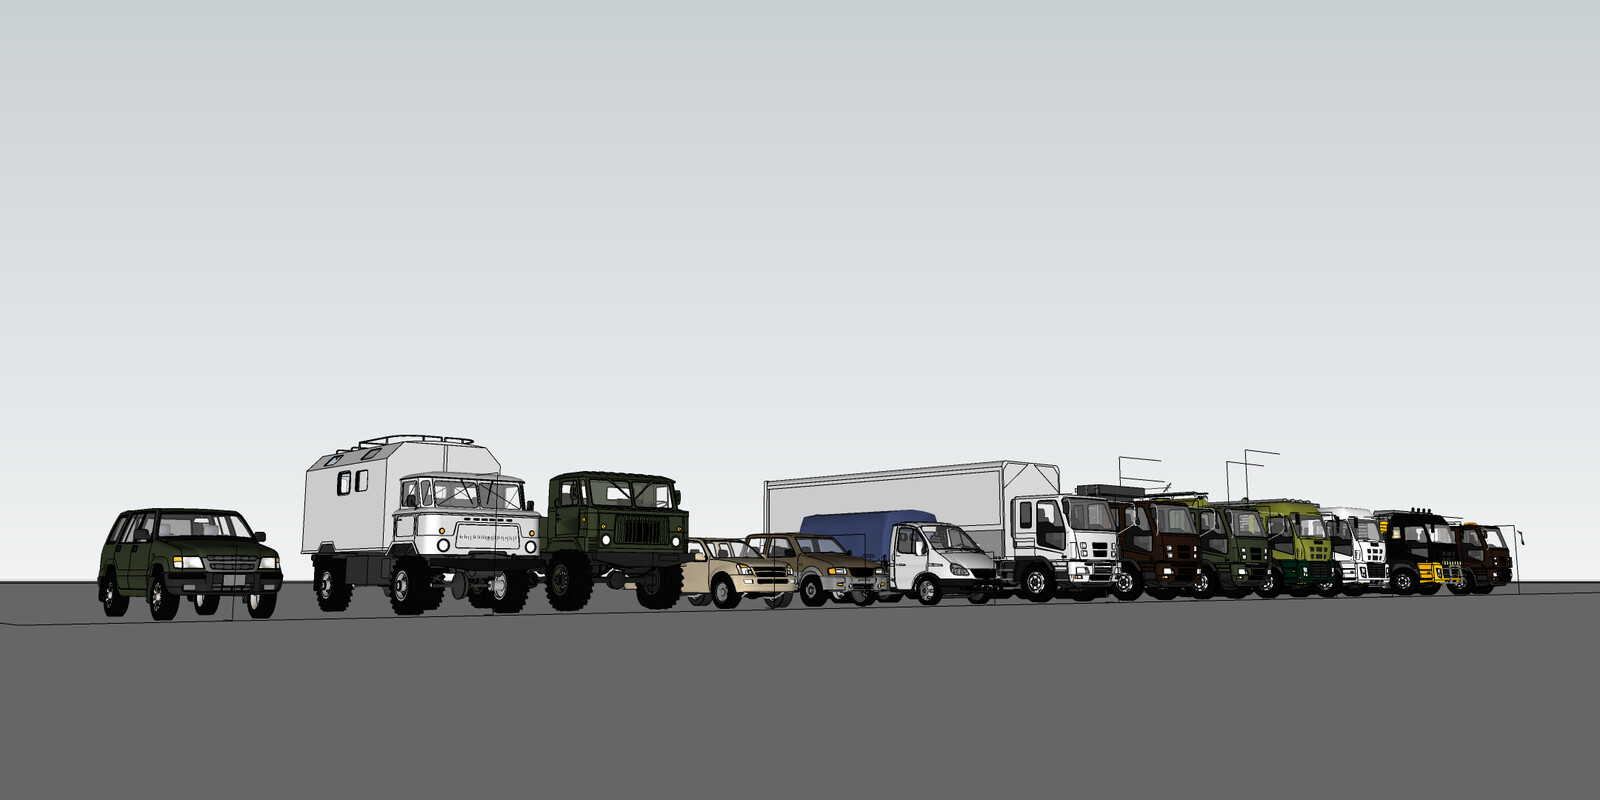 SketchUp 2020 Korean vehicles-Scene 1 SU